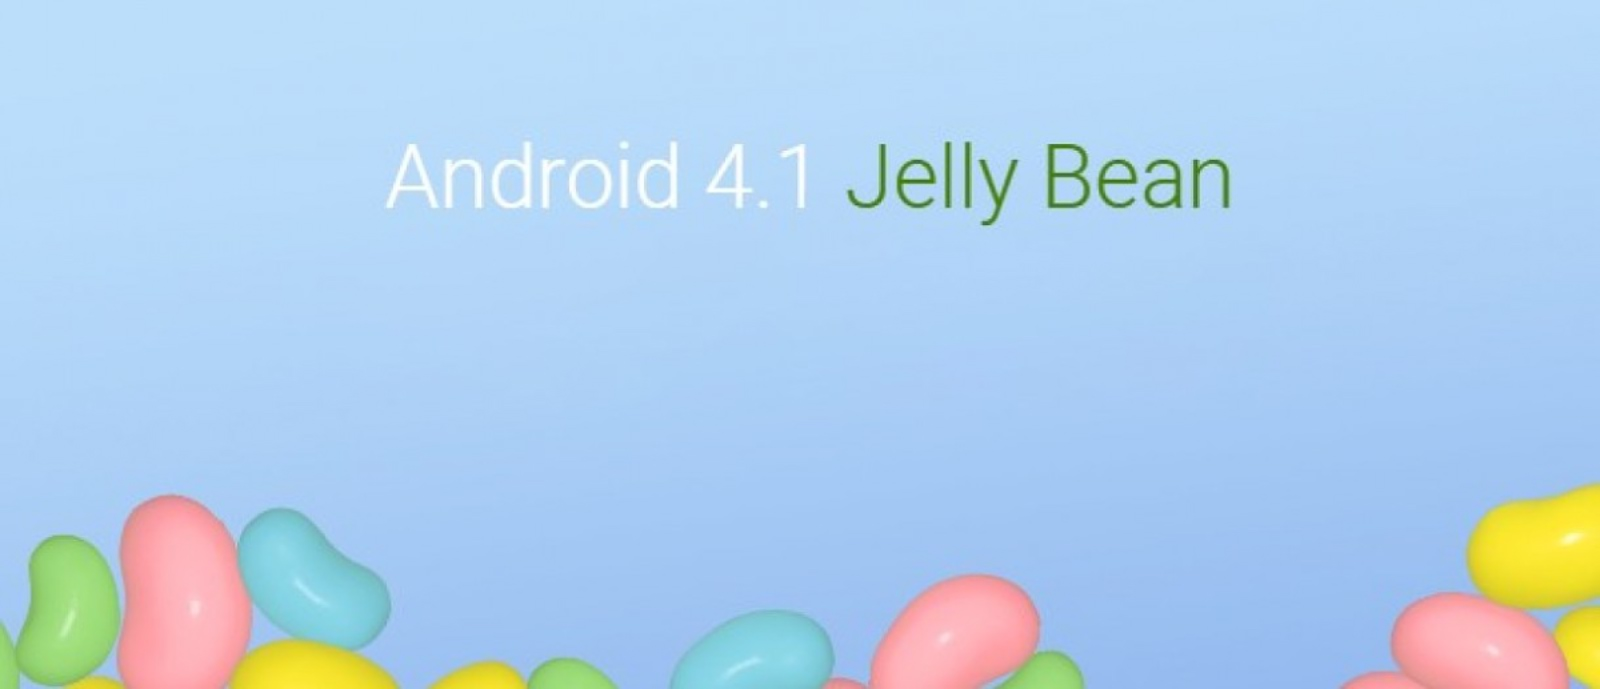 آپدیت Play Services اندروید Jelly Bean